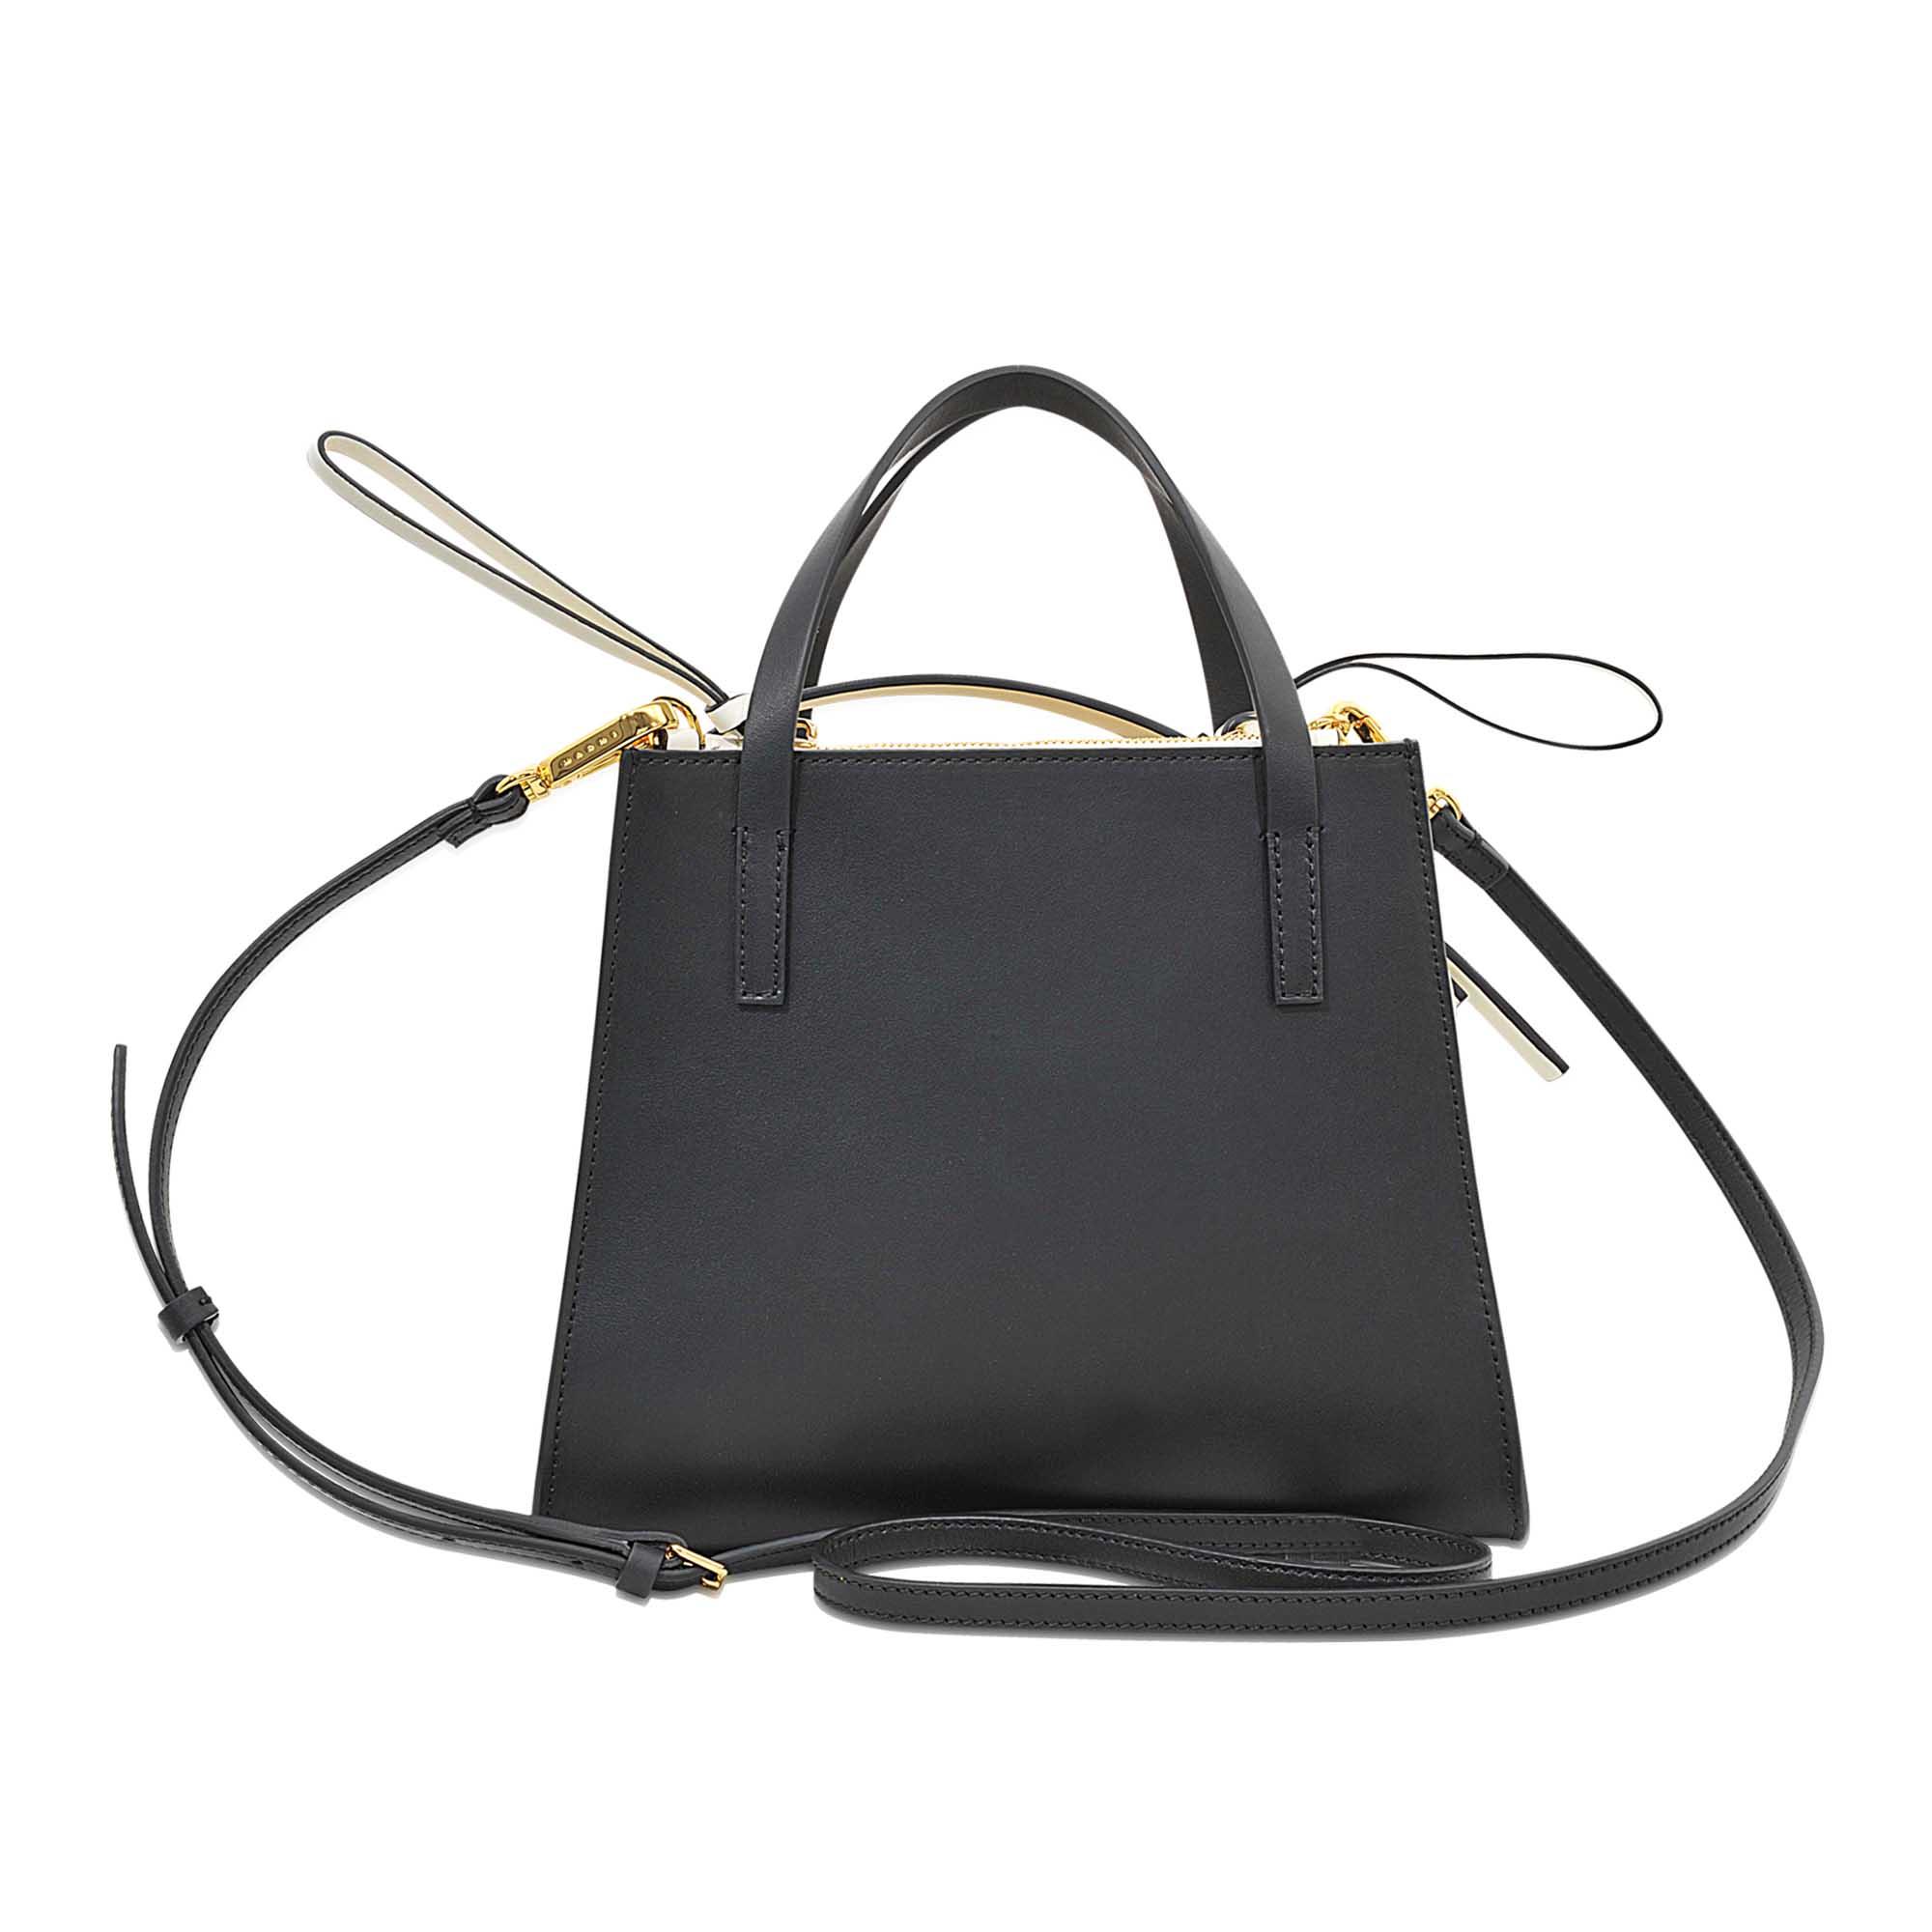 ba00715625 Lyst - Marni 9 To 5 Mini Leather Tote in Black